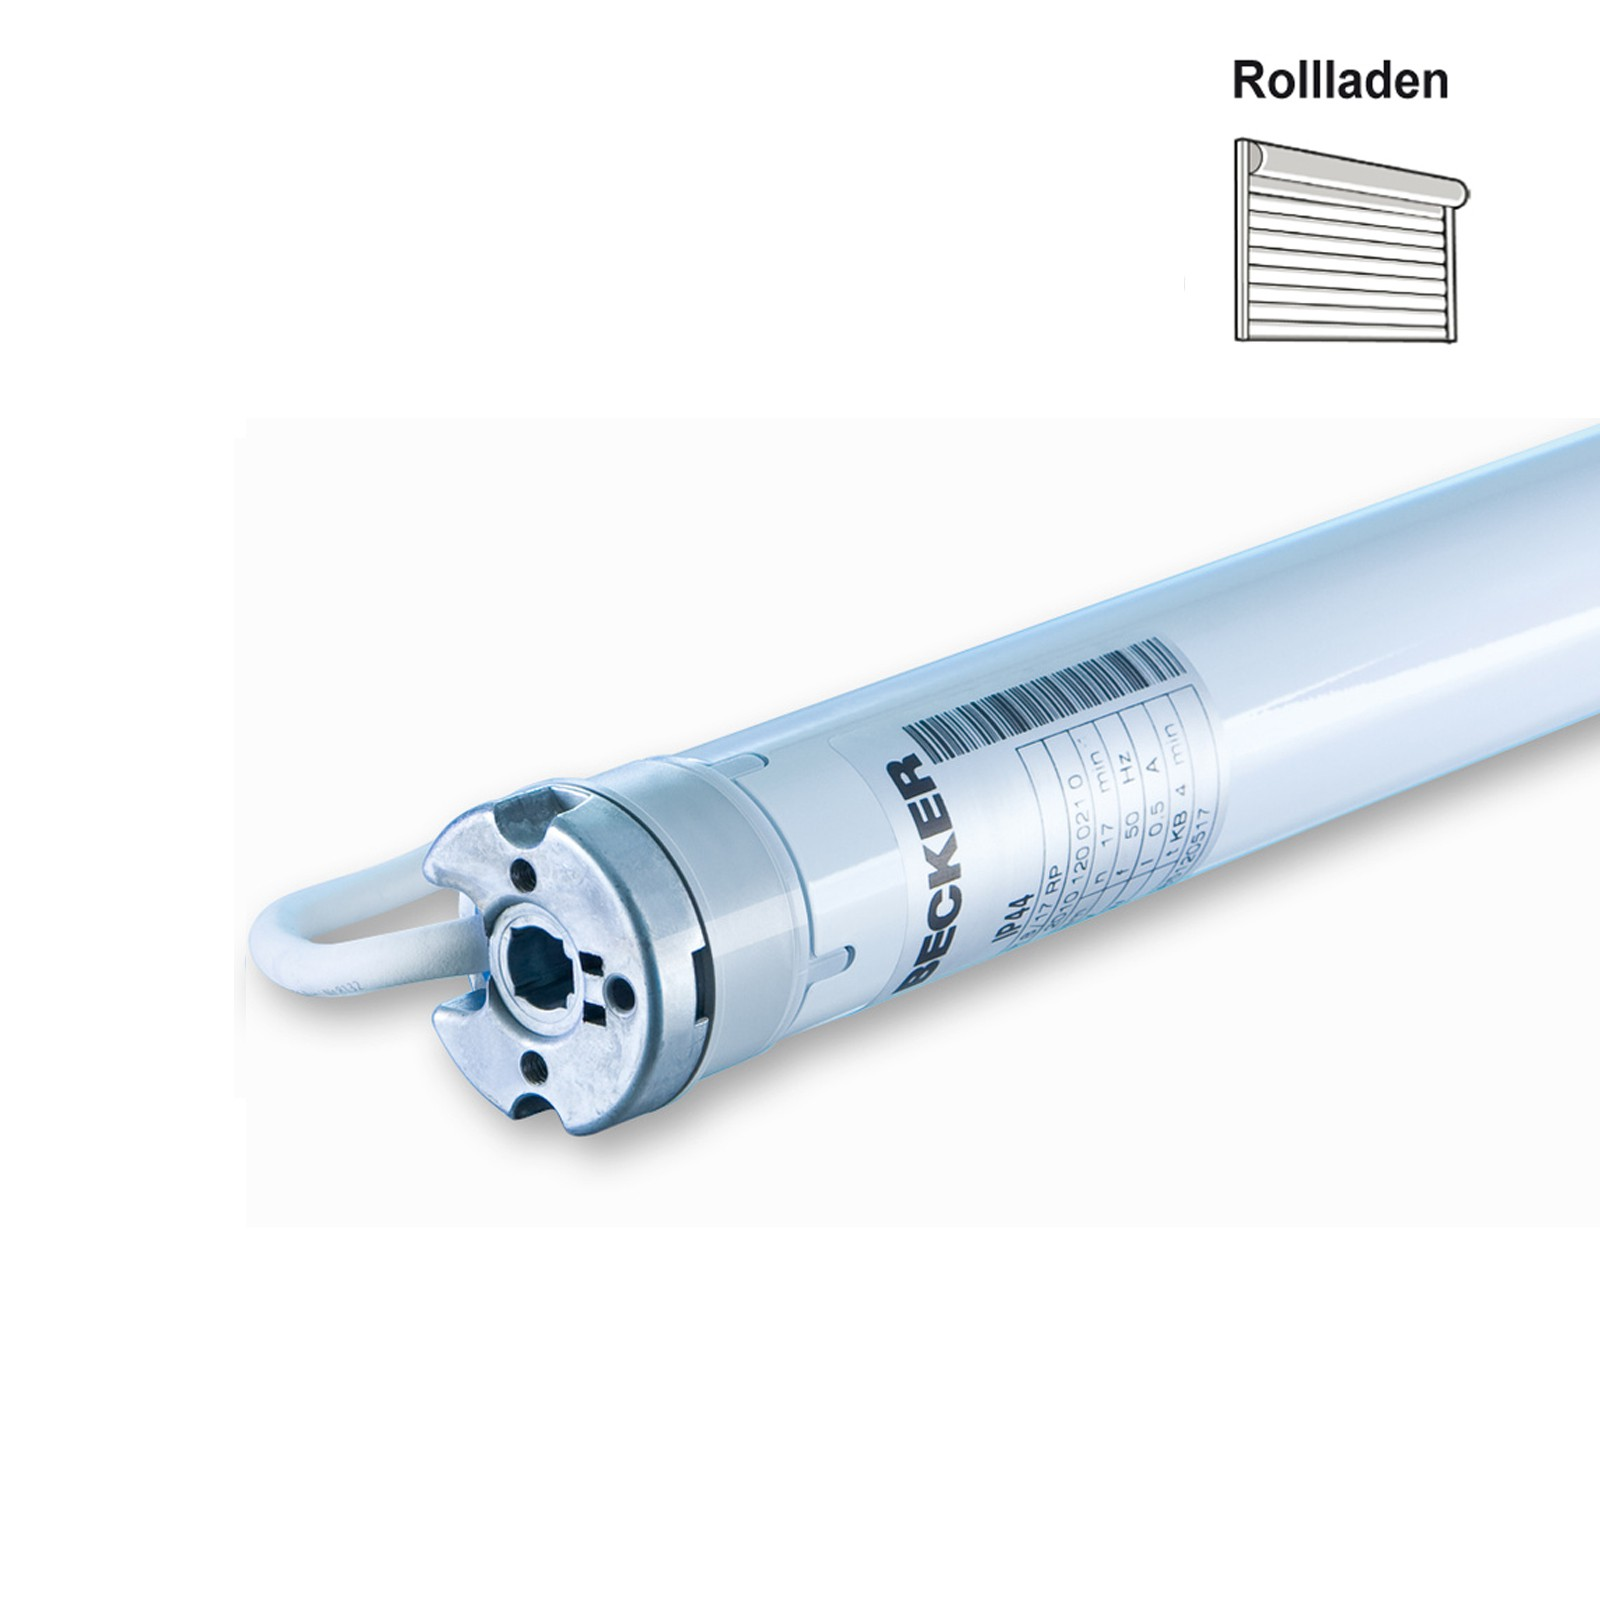 Rolladenmotor Becker R-RP Grafik